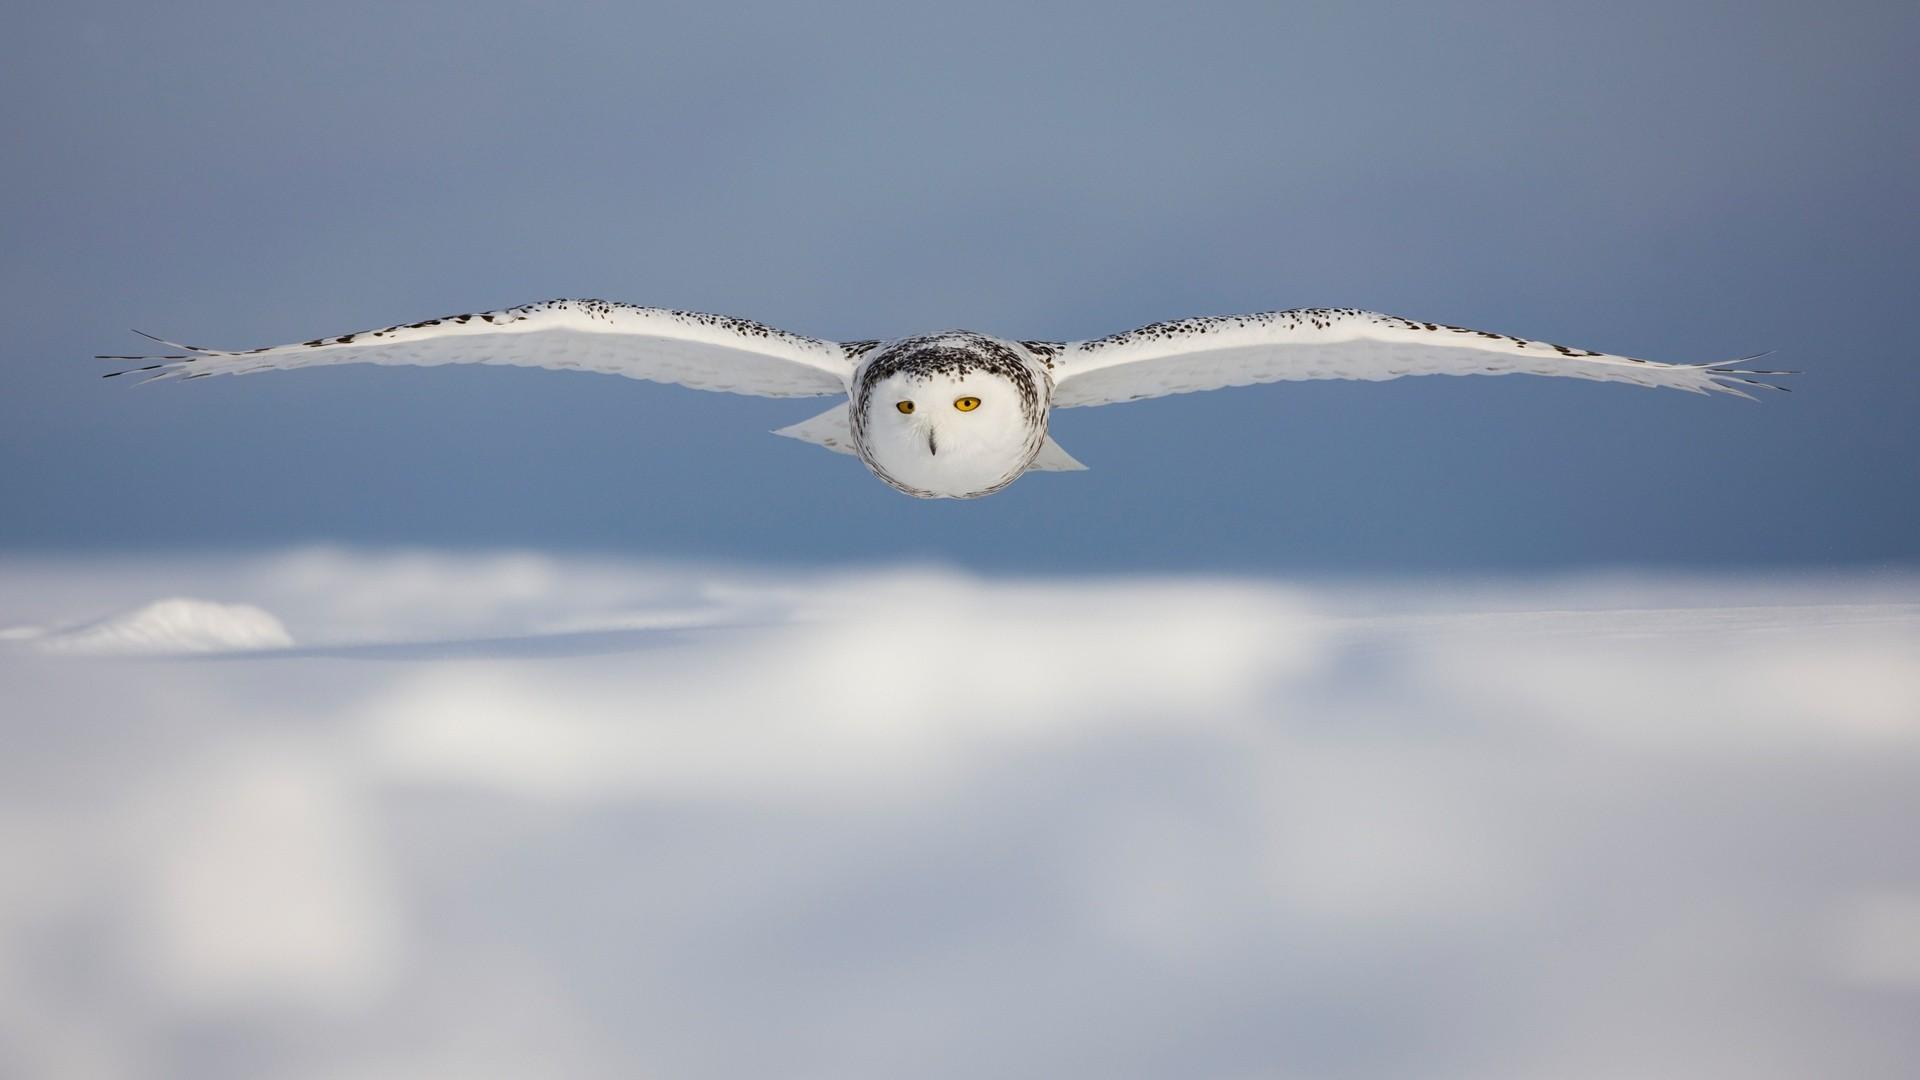 White Owl Wallpaper 30387 1920x1080 px HDWallSourcecom